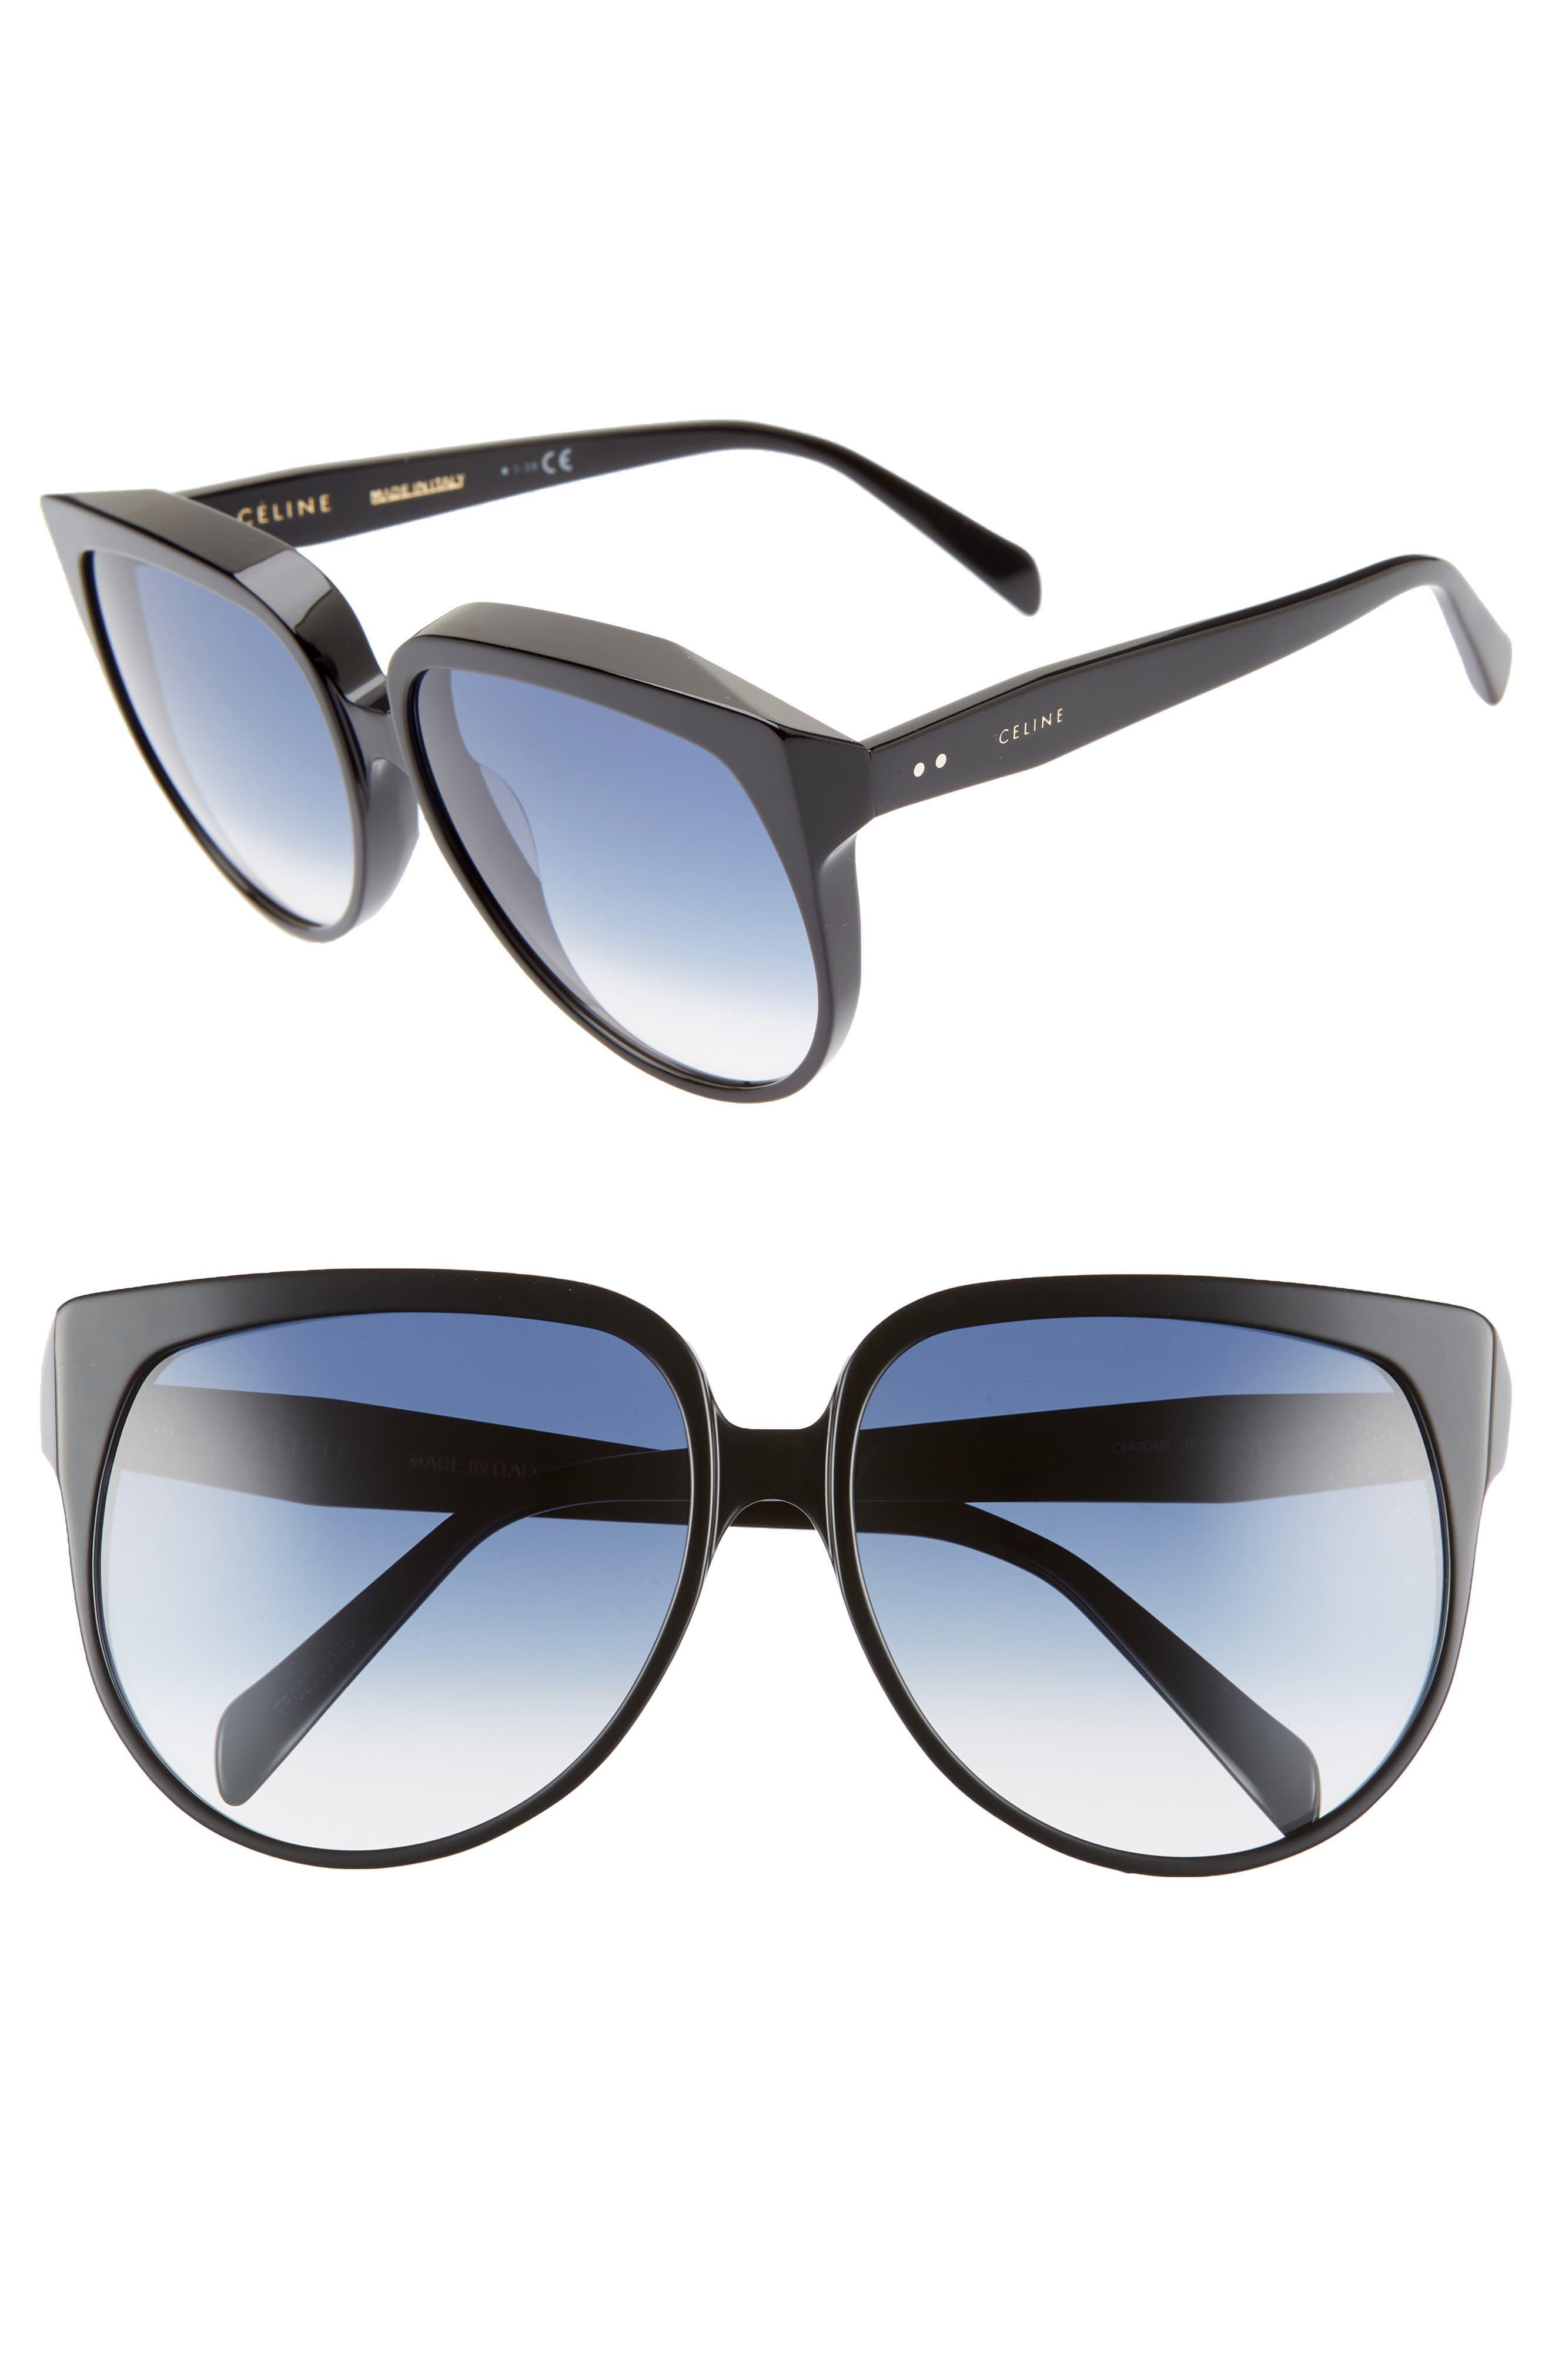 62Mm Special Fit Oversize Cat Eye Sunglasses - Shiny Black/ Blue Gradient